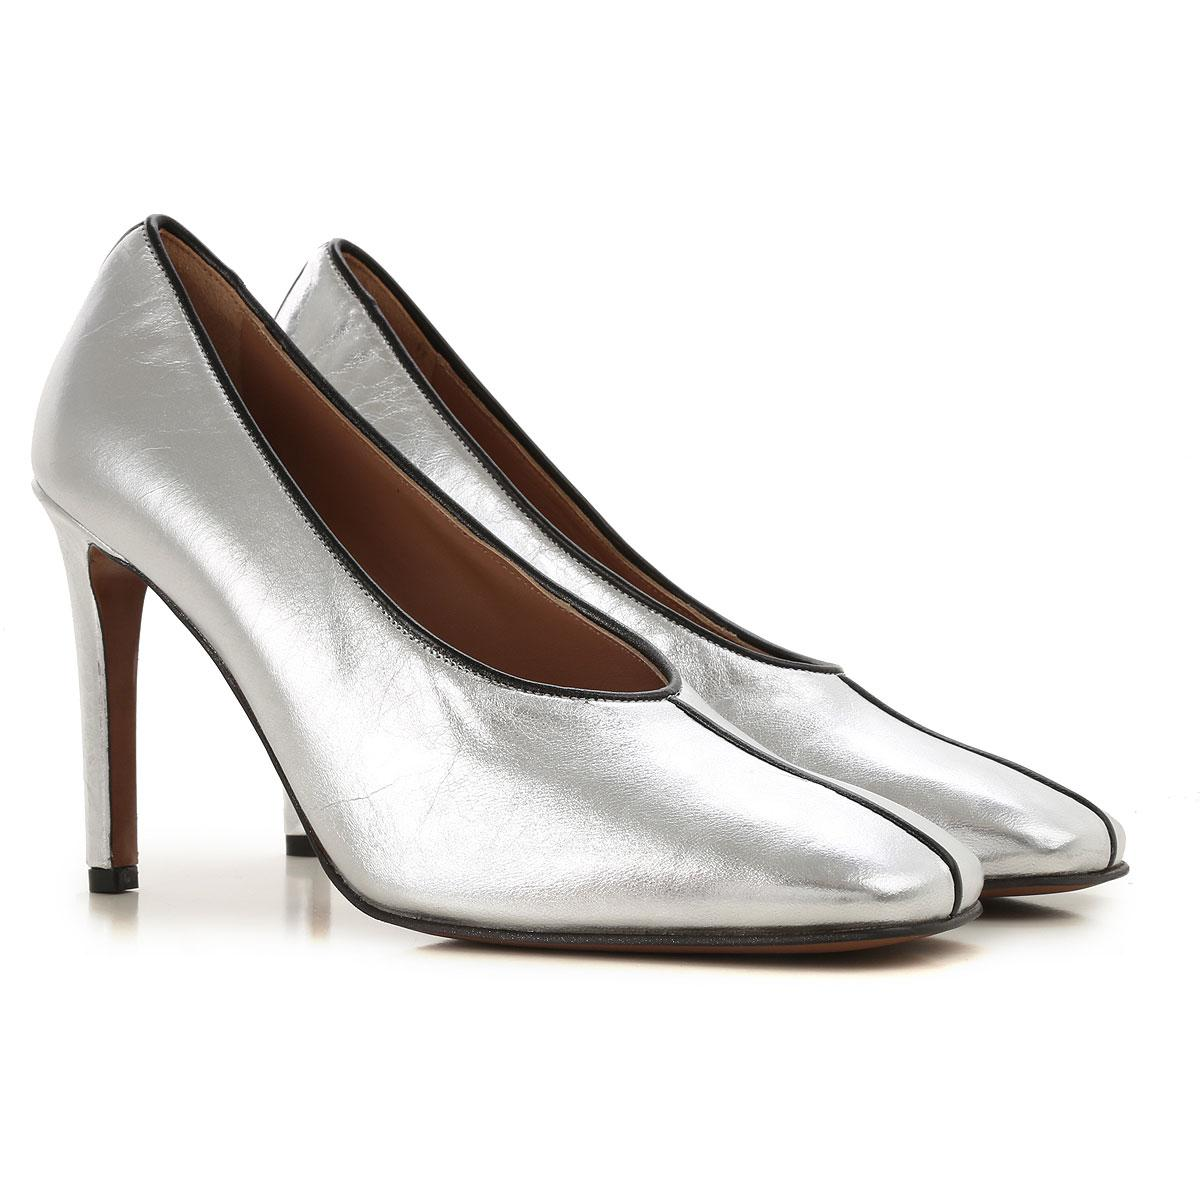 376dd715a44 Lyst - L Autre Chose Pumps   High Heels For Women On Sale in Metallic